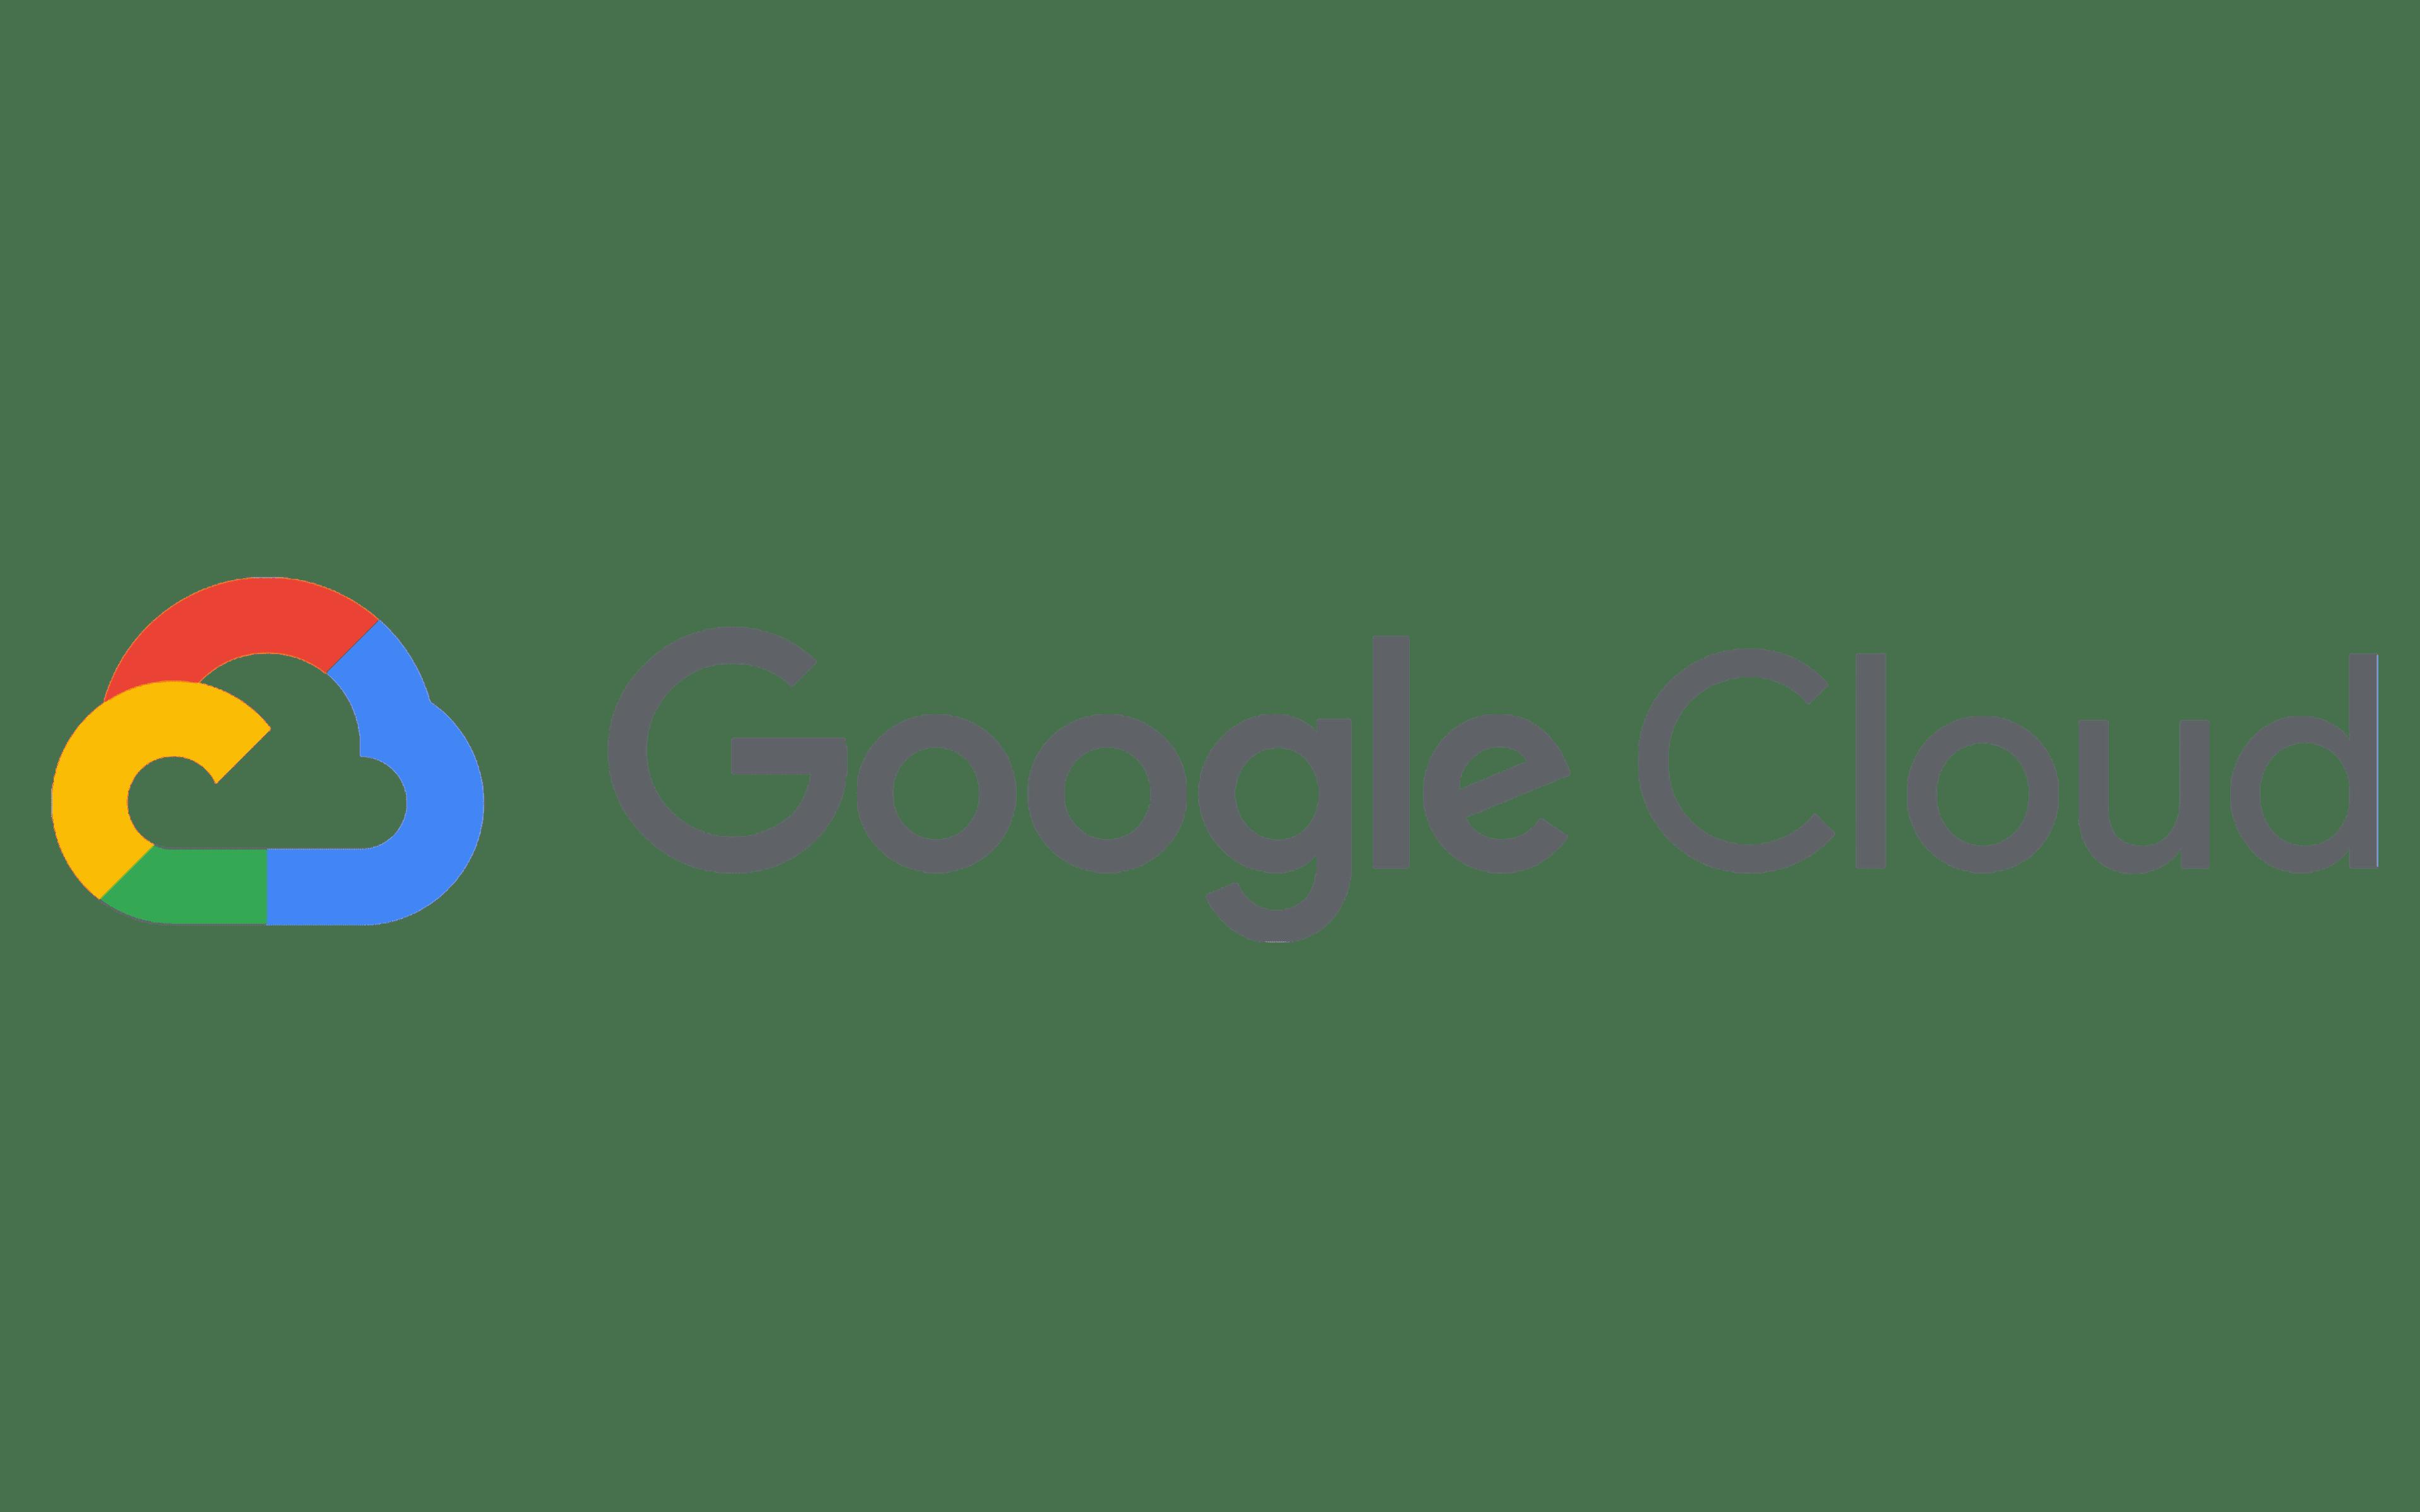 google-cloud-platform-costa-rica